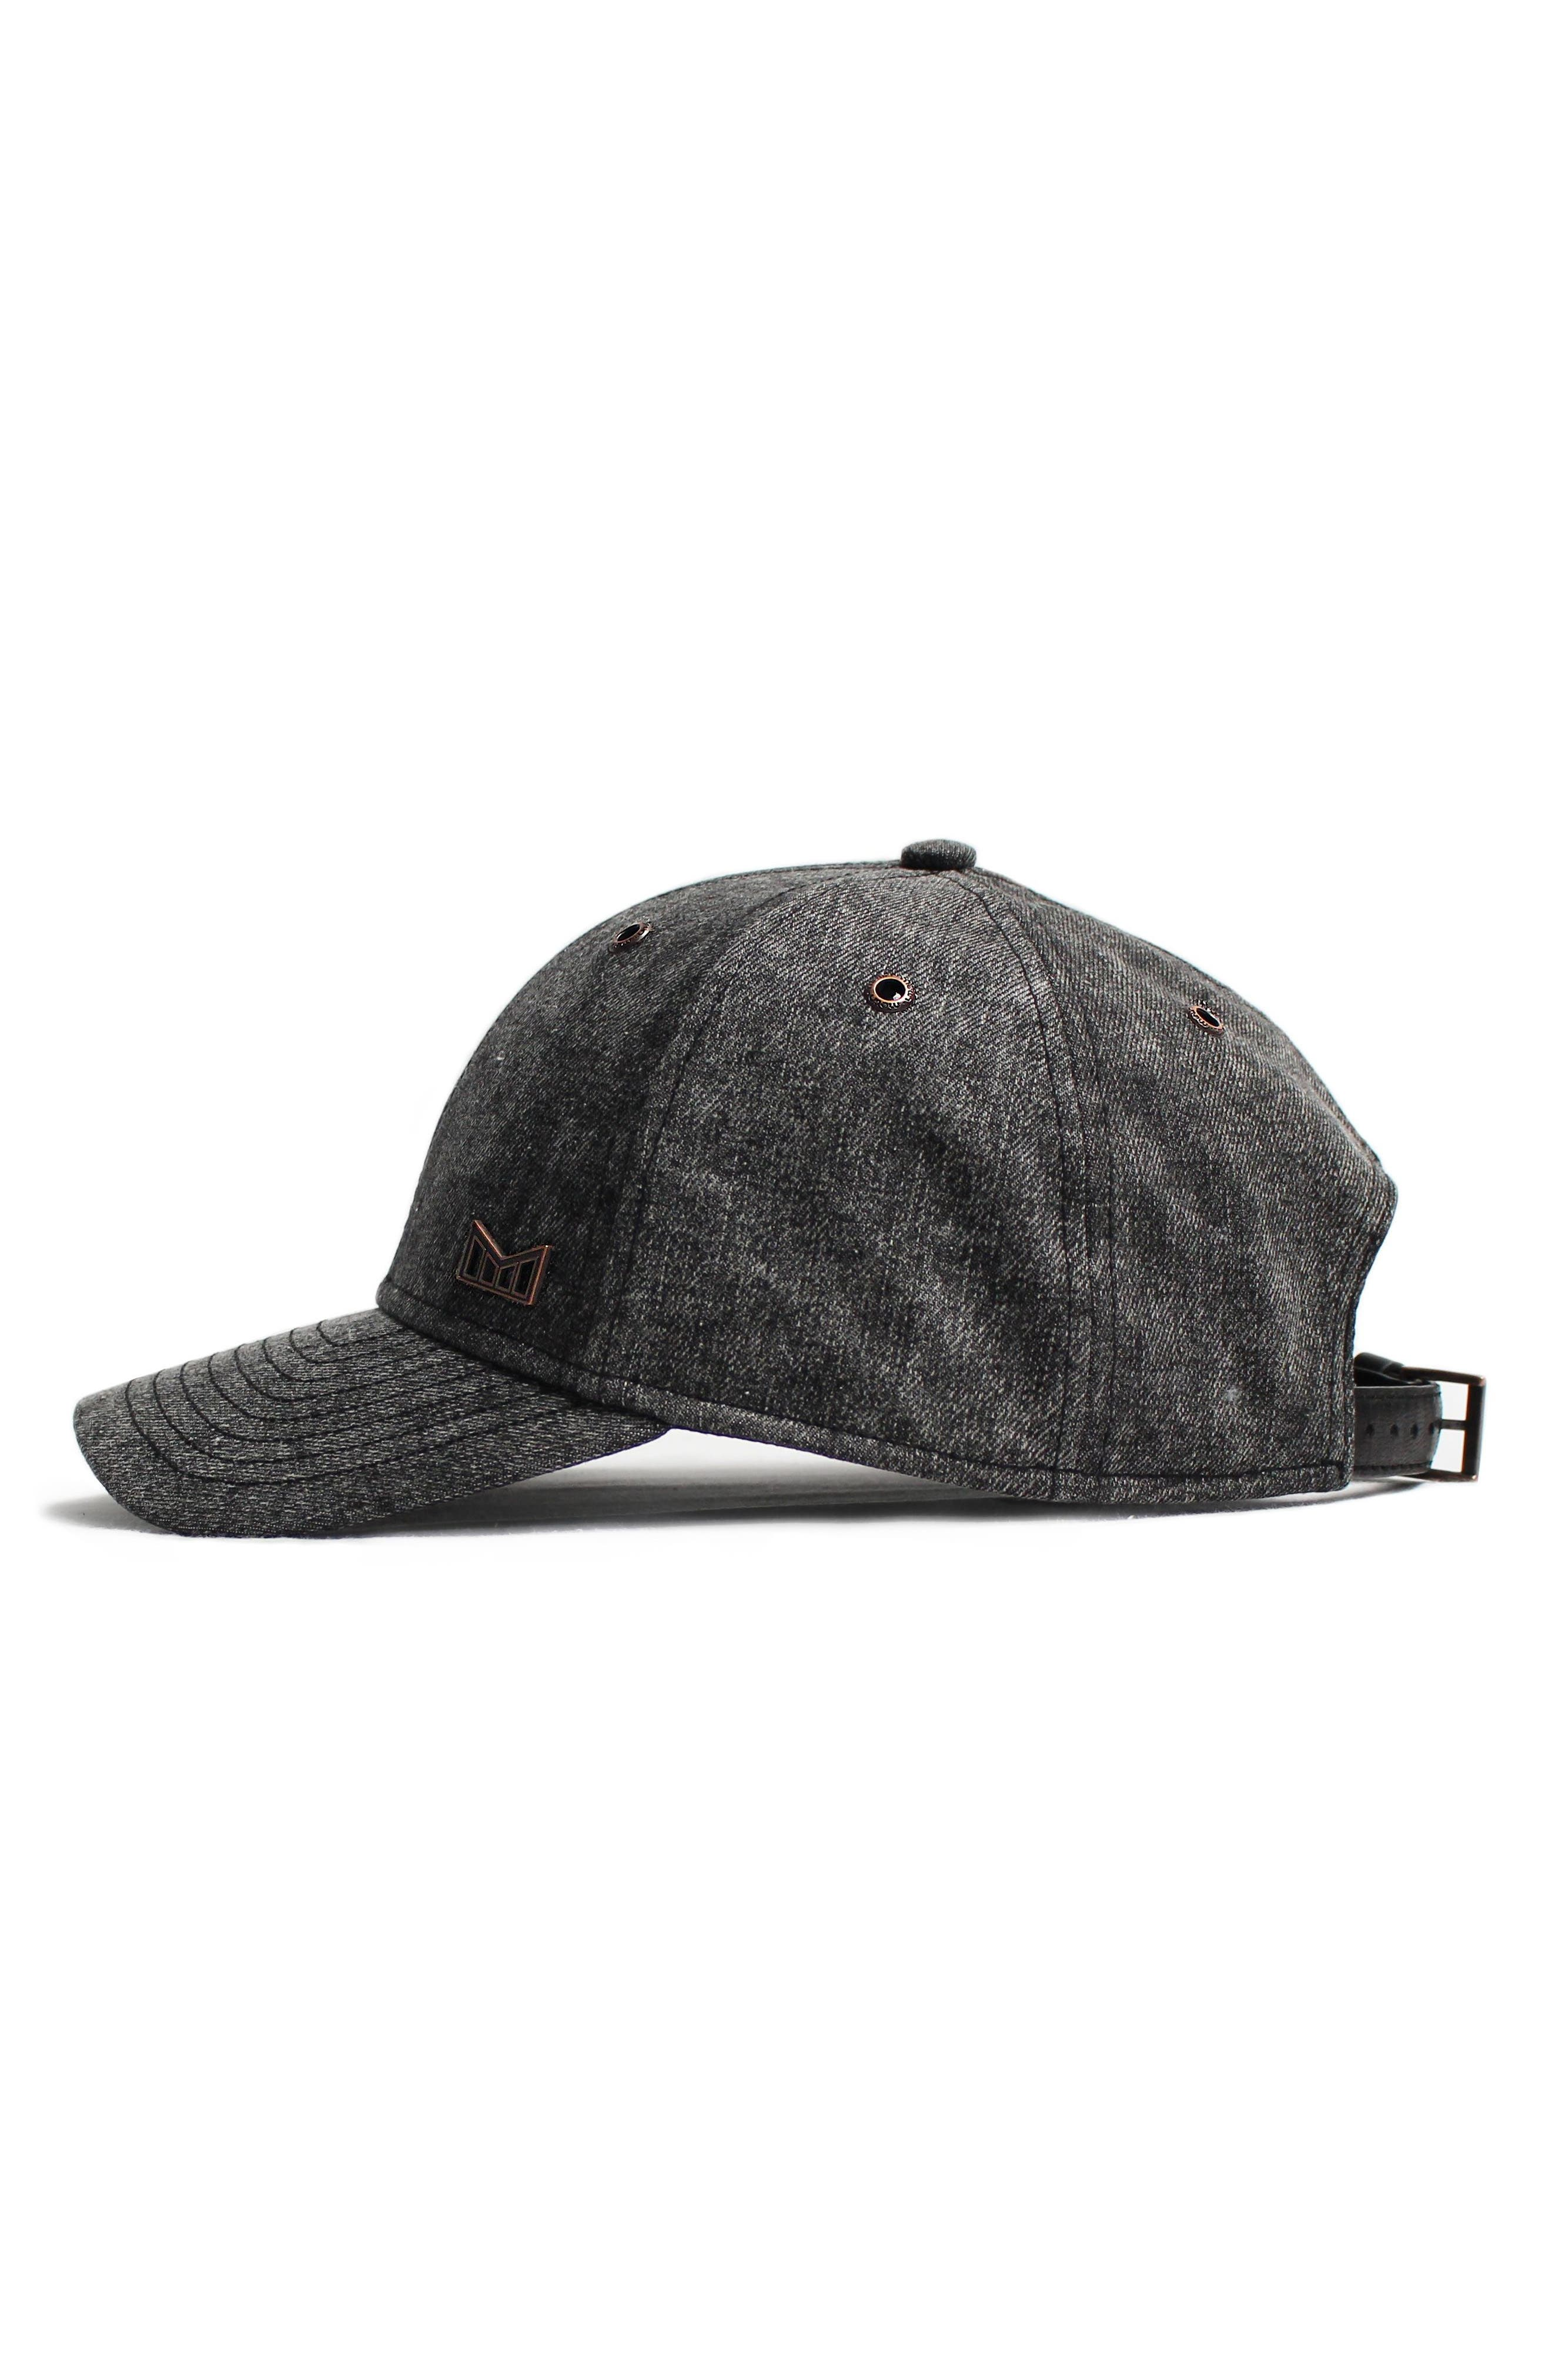 'The Haze' Vintage Fit Baseball Cap,                             Alternate thumbnail 4, color,                             001